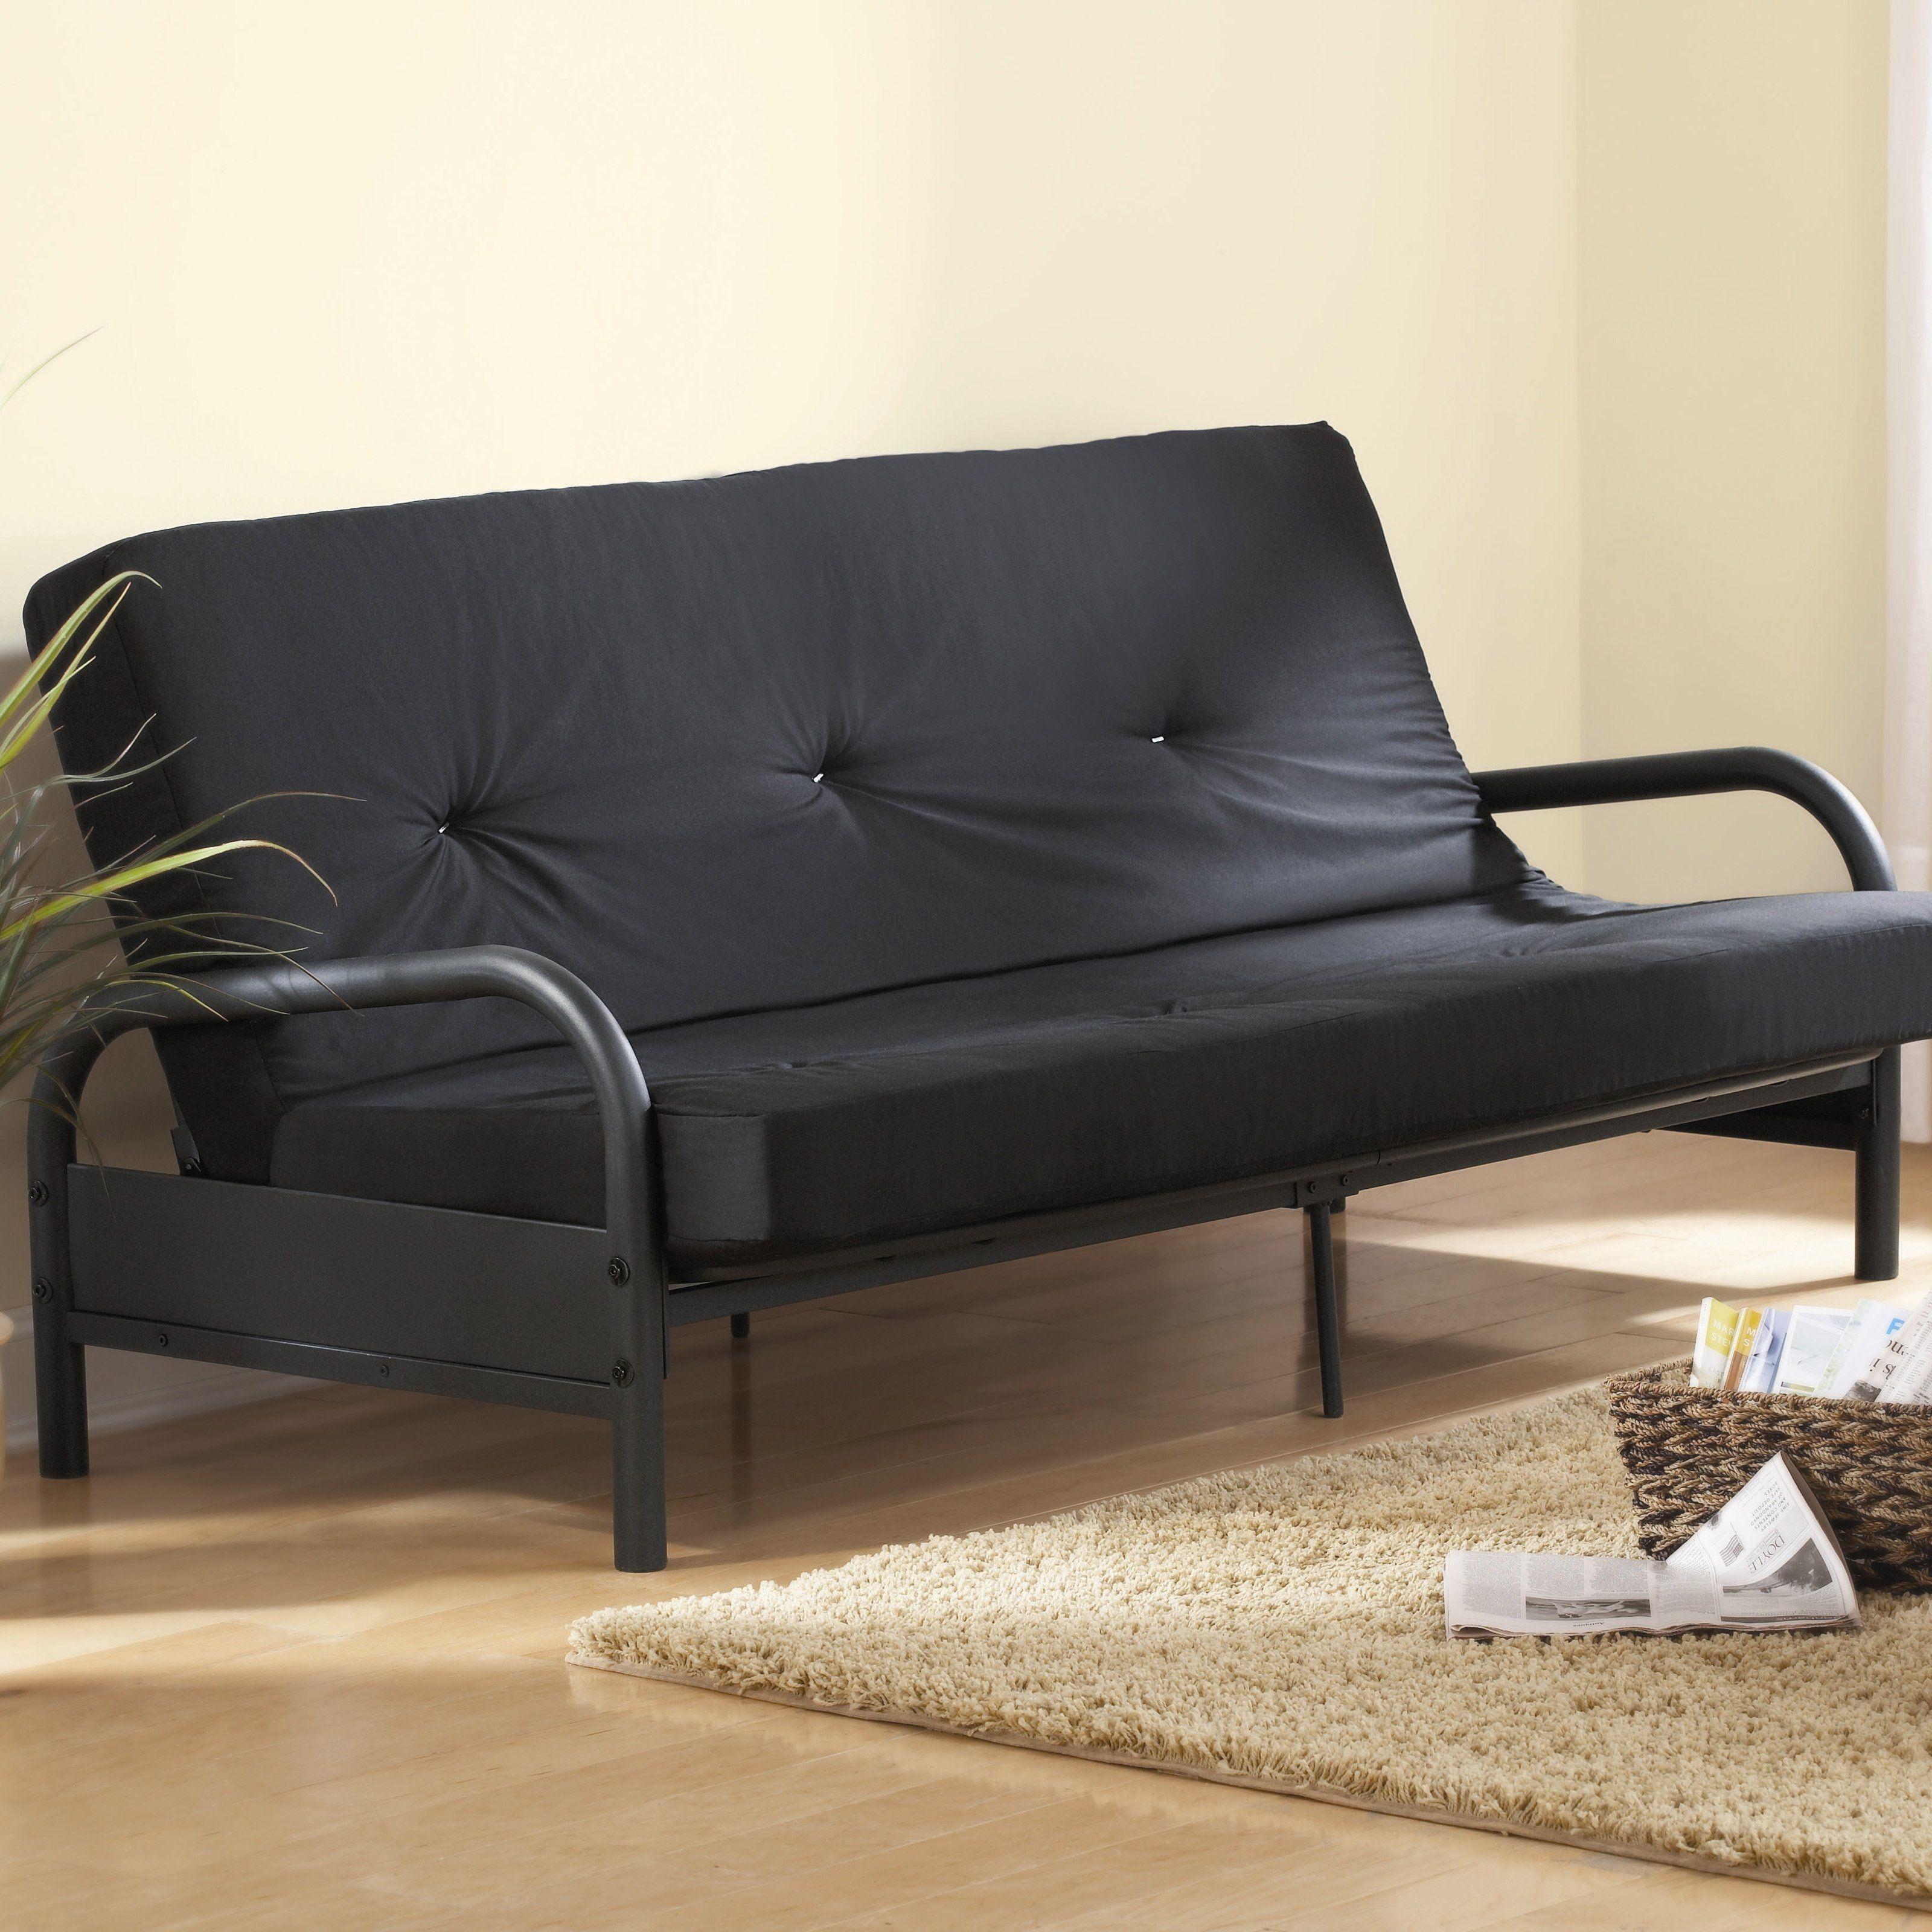 Futon Sofa Bed Mattress Cover | http://ml2r.com | Pinterest